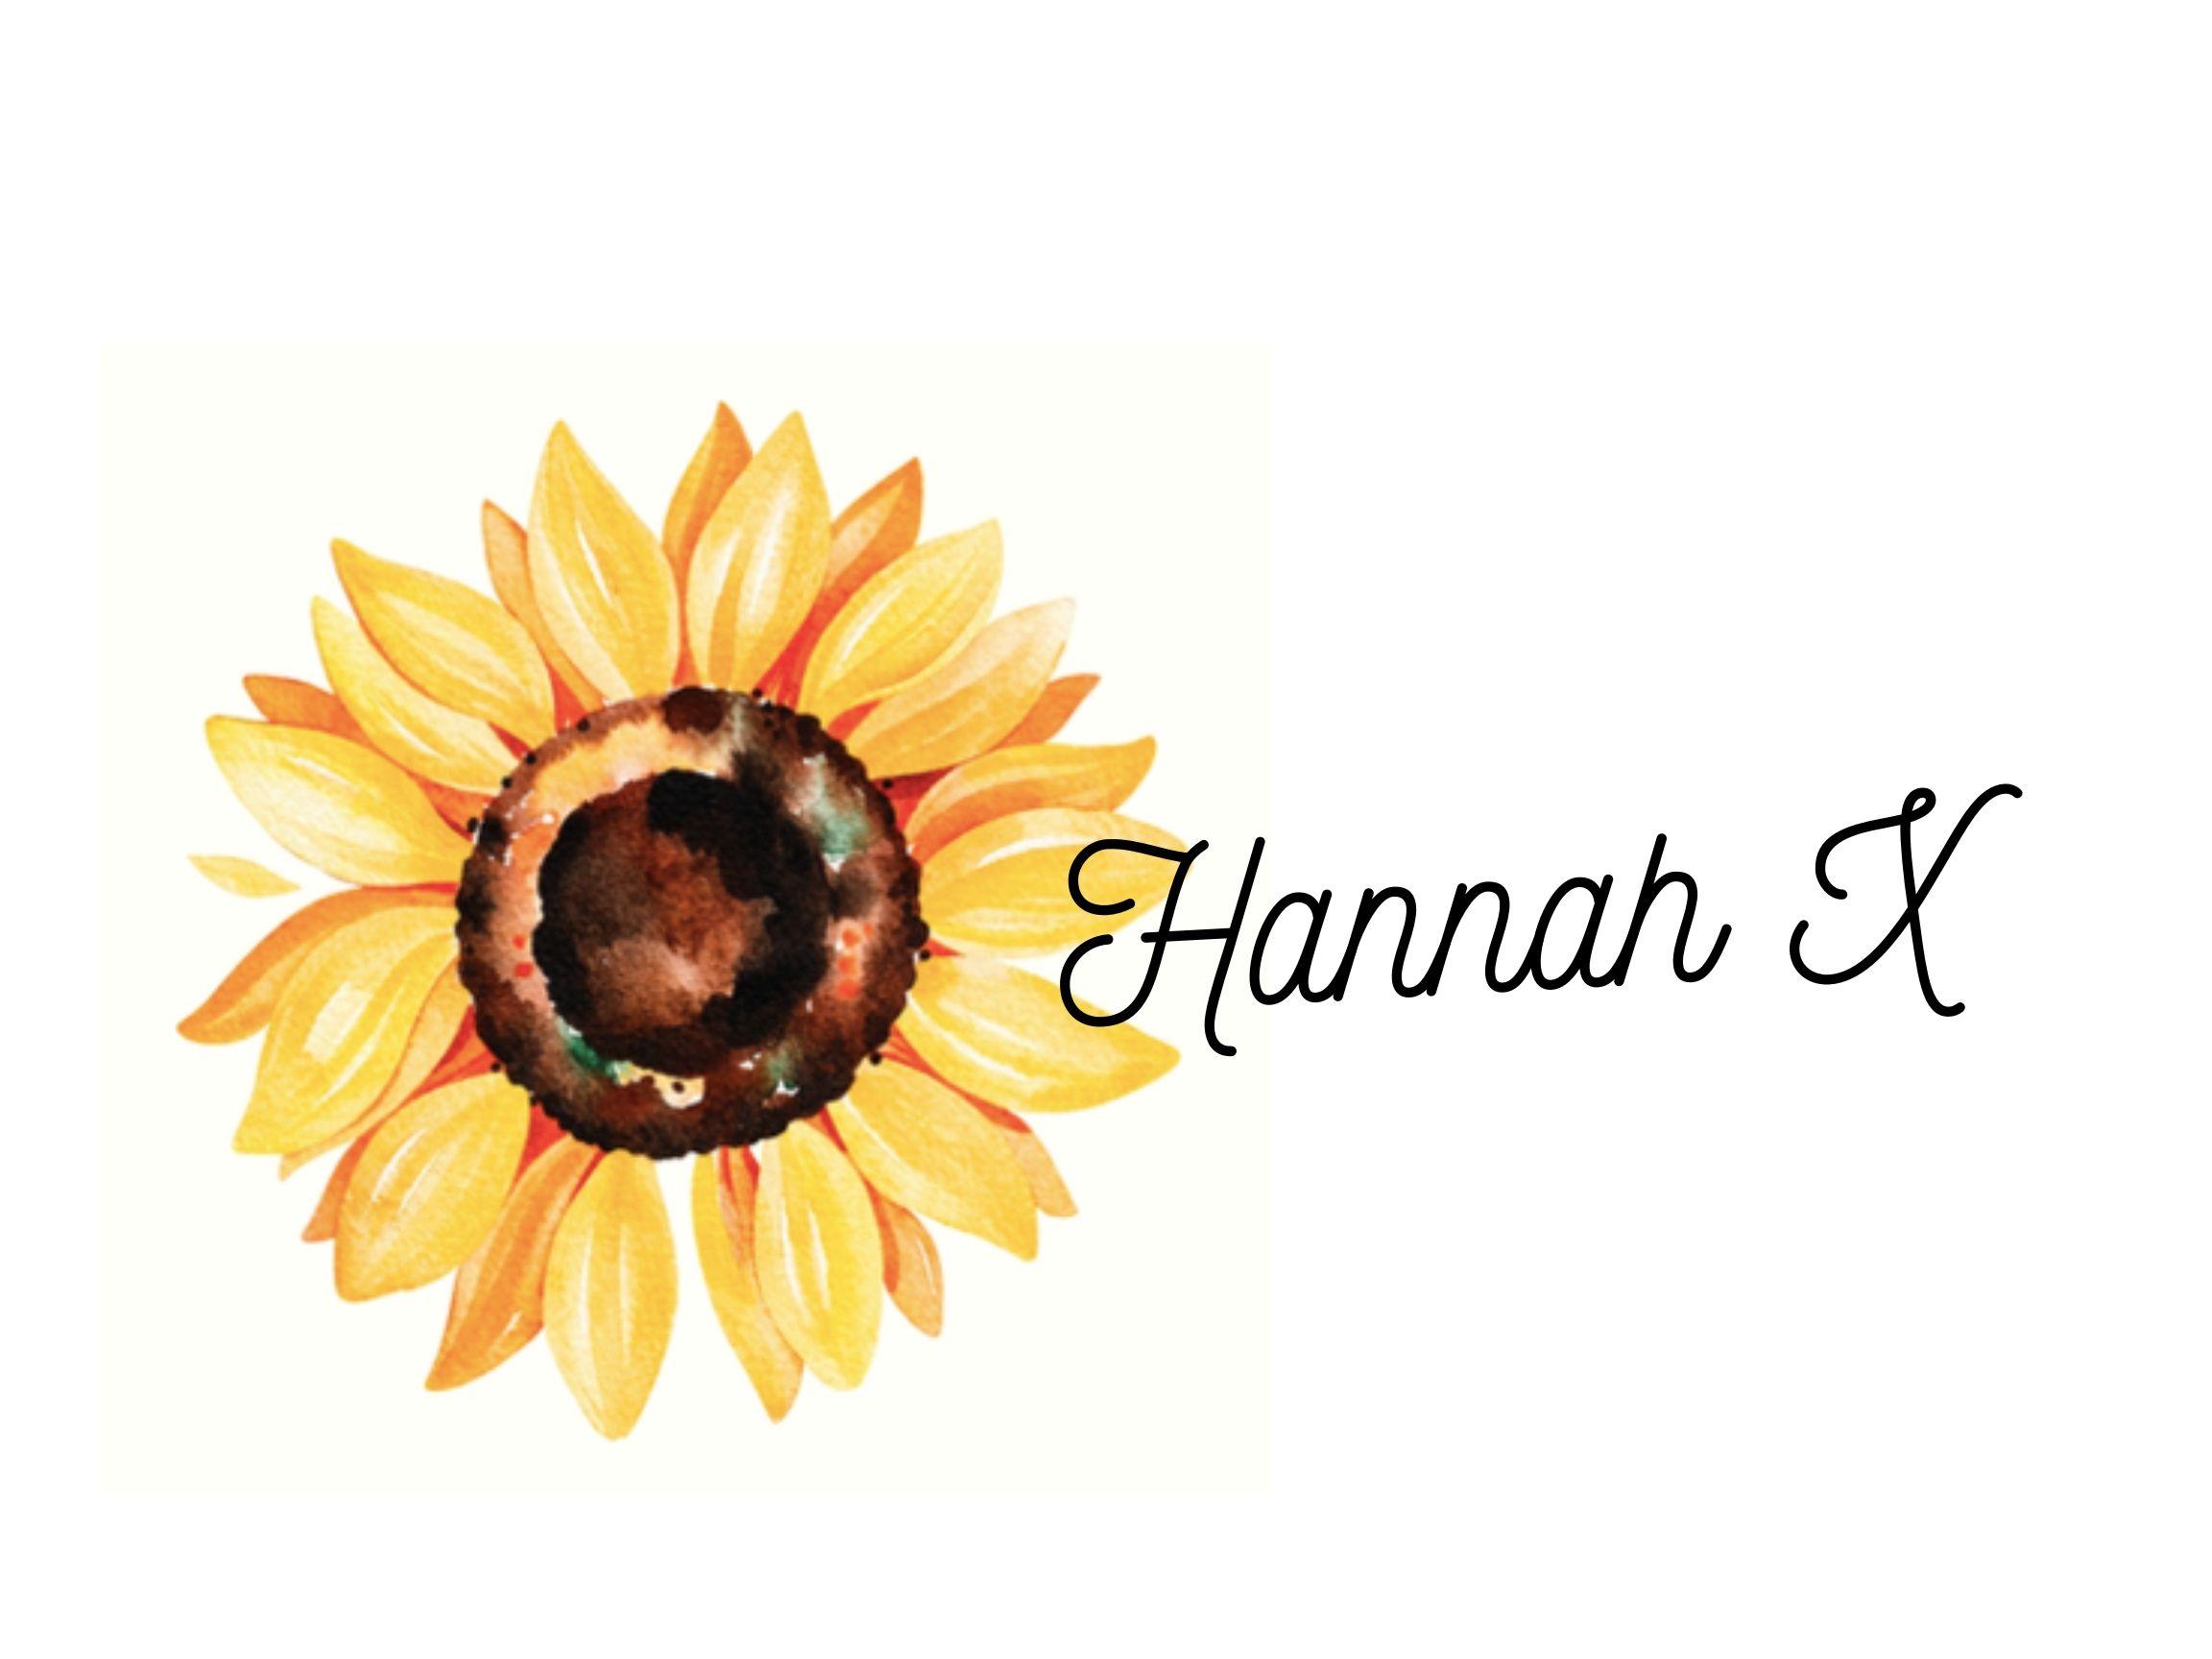 Hannah X